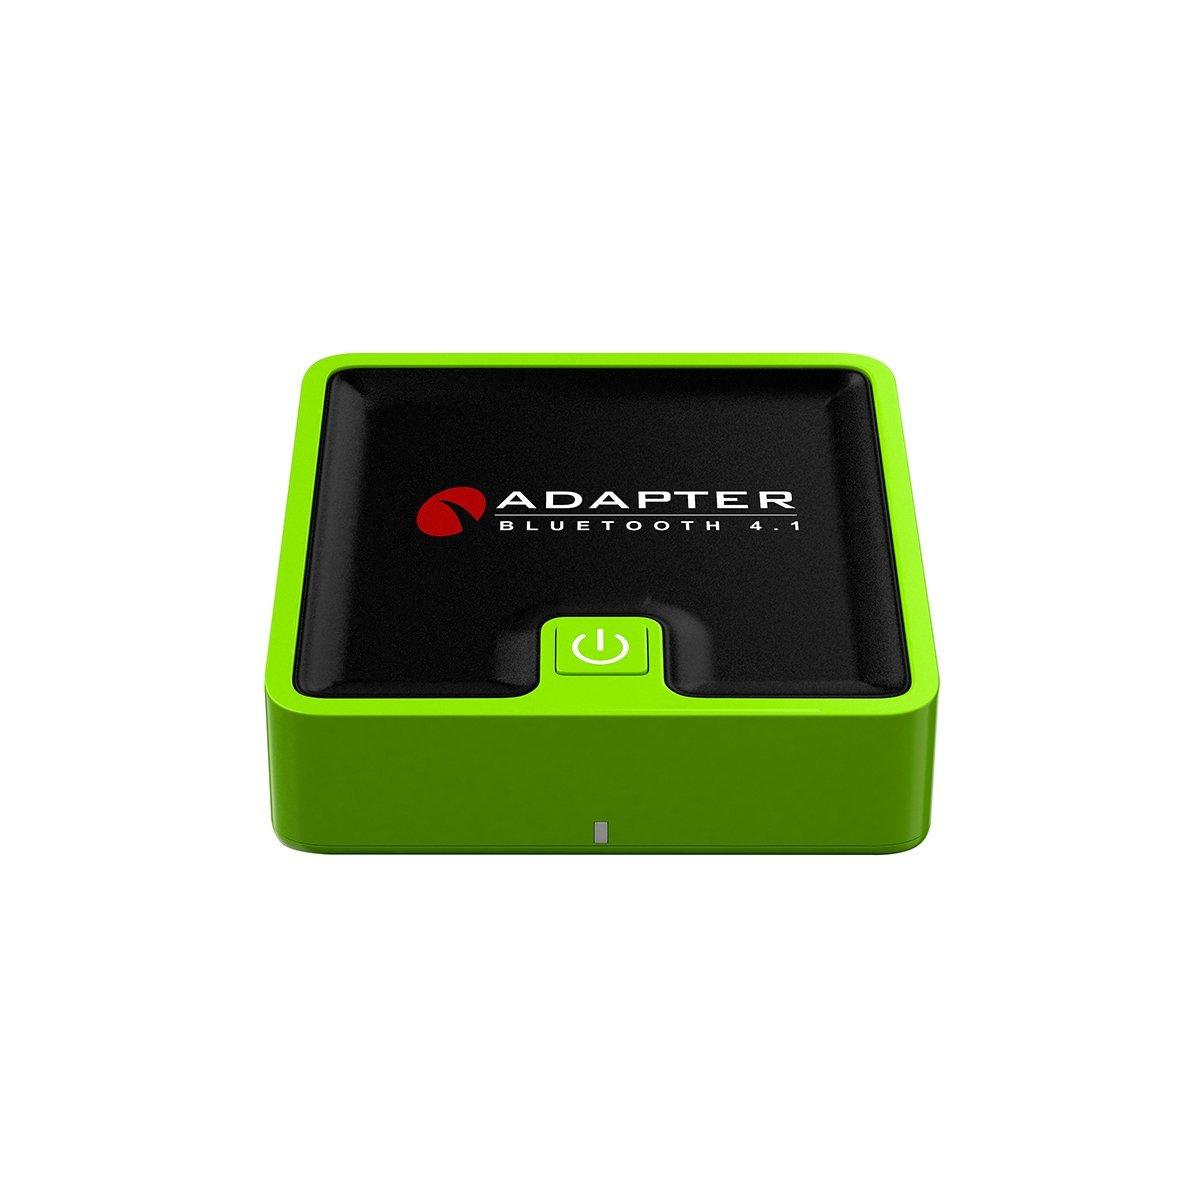 TechCode Bluetooth Transmitter/Receiver, 2 in 1 Digital Optical SPDIF, APT-X Aptx, AUX 3.5mm, Wireless Audio Adapter for TV/Home Stereo System/Headphones/Speakers(Green)